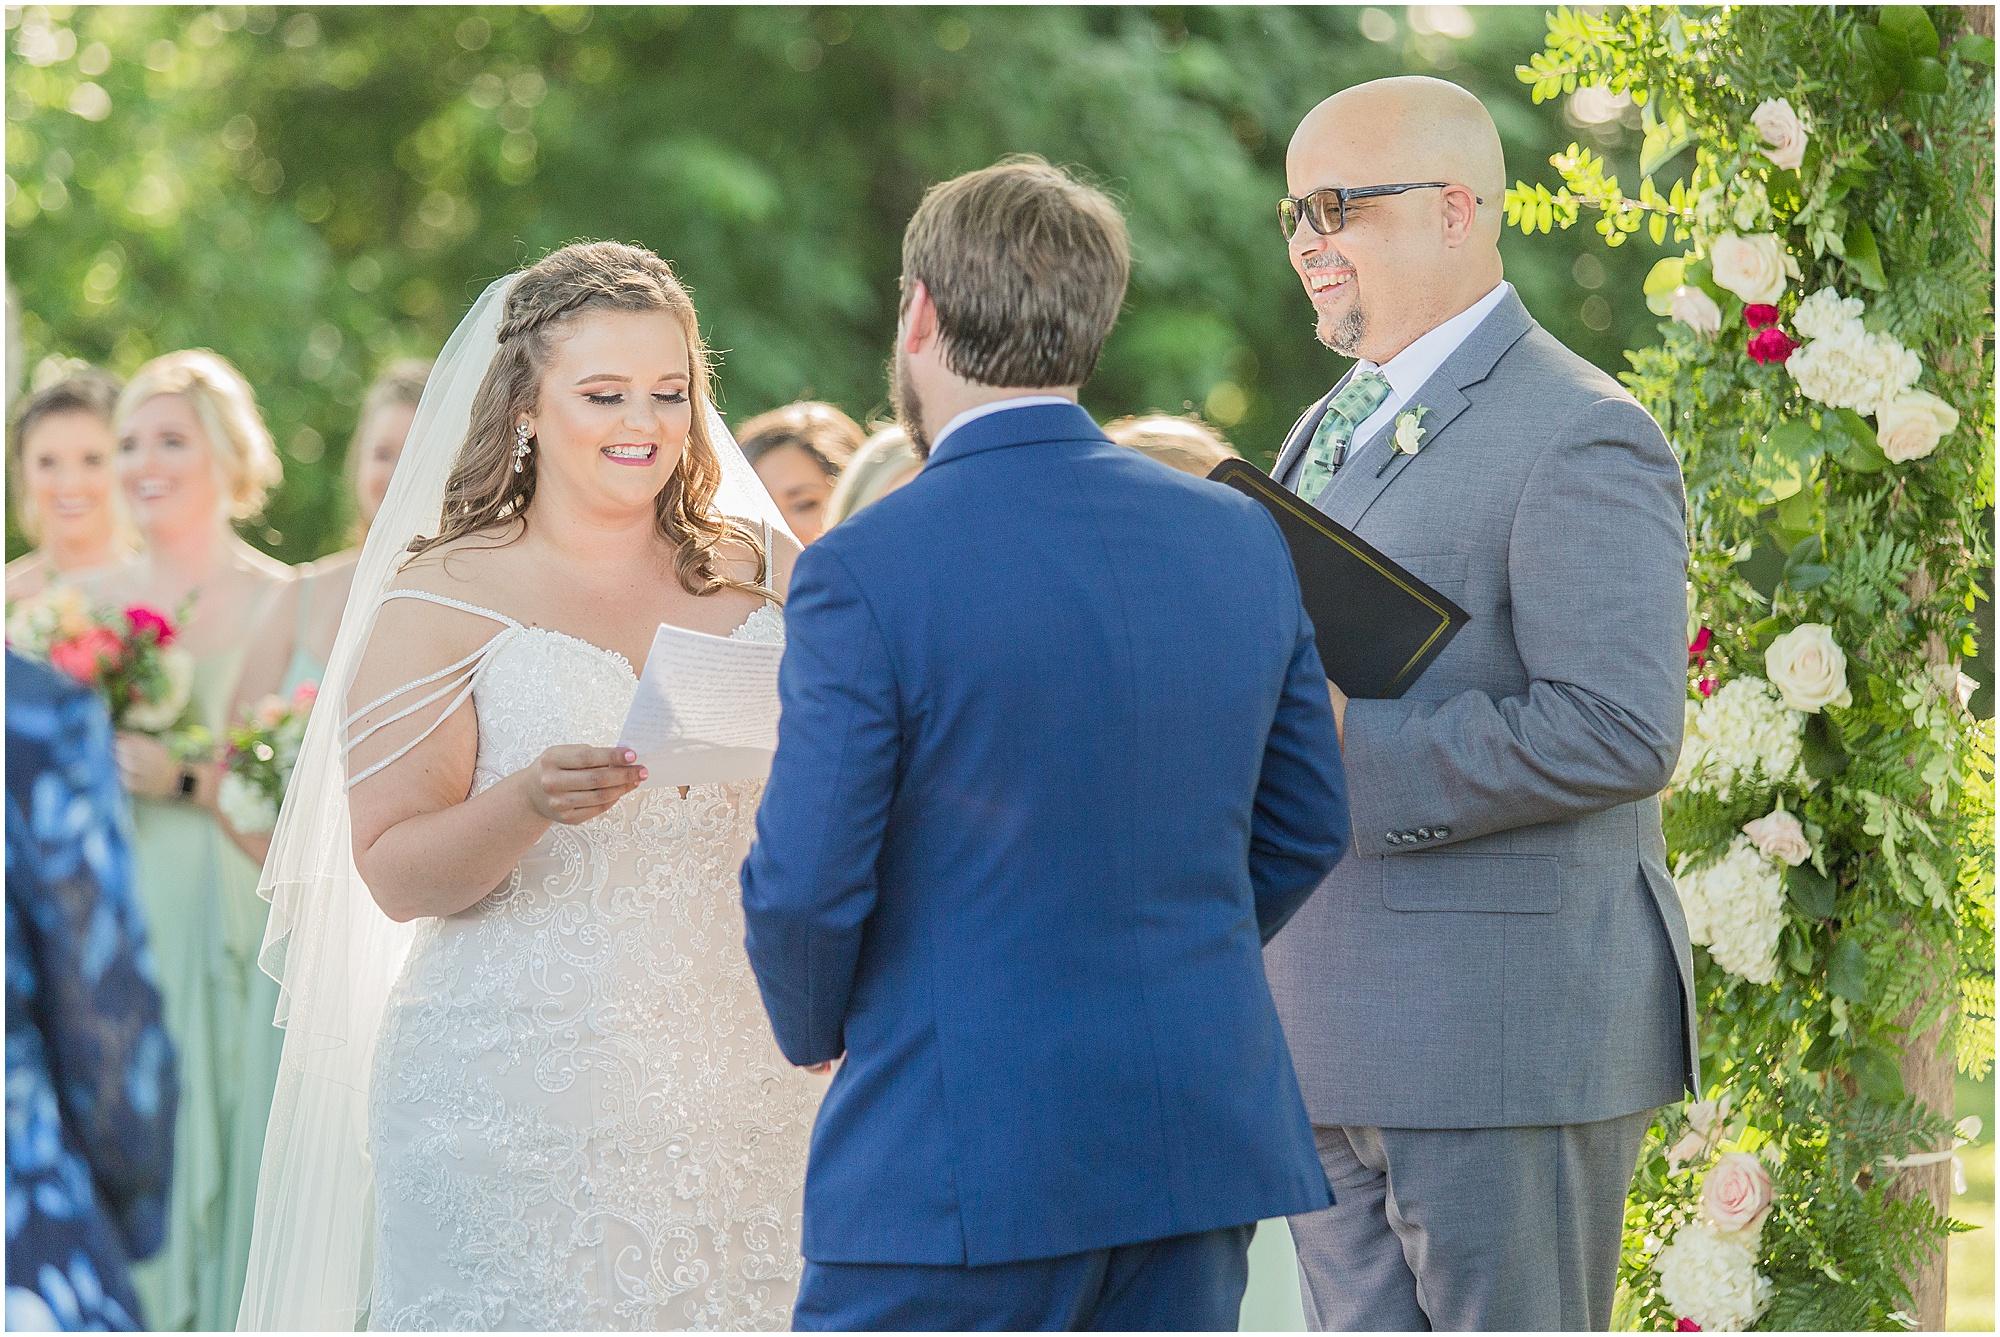 starkville-mississippi-wedding-page-place-dodson-farms_0064.jpg